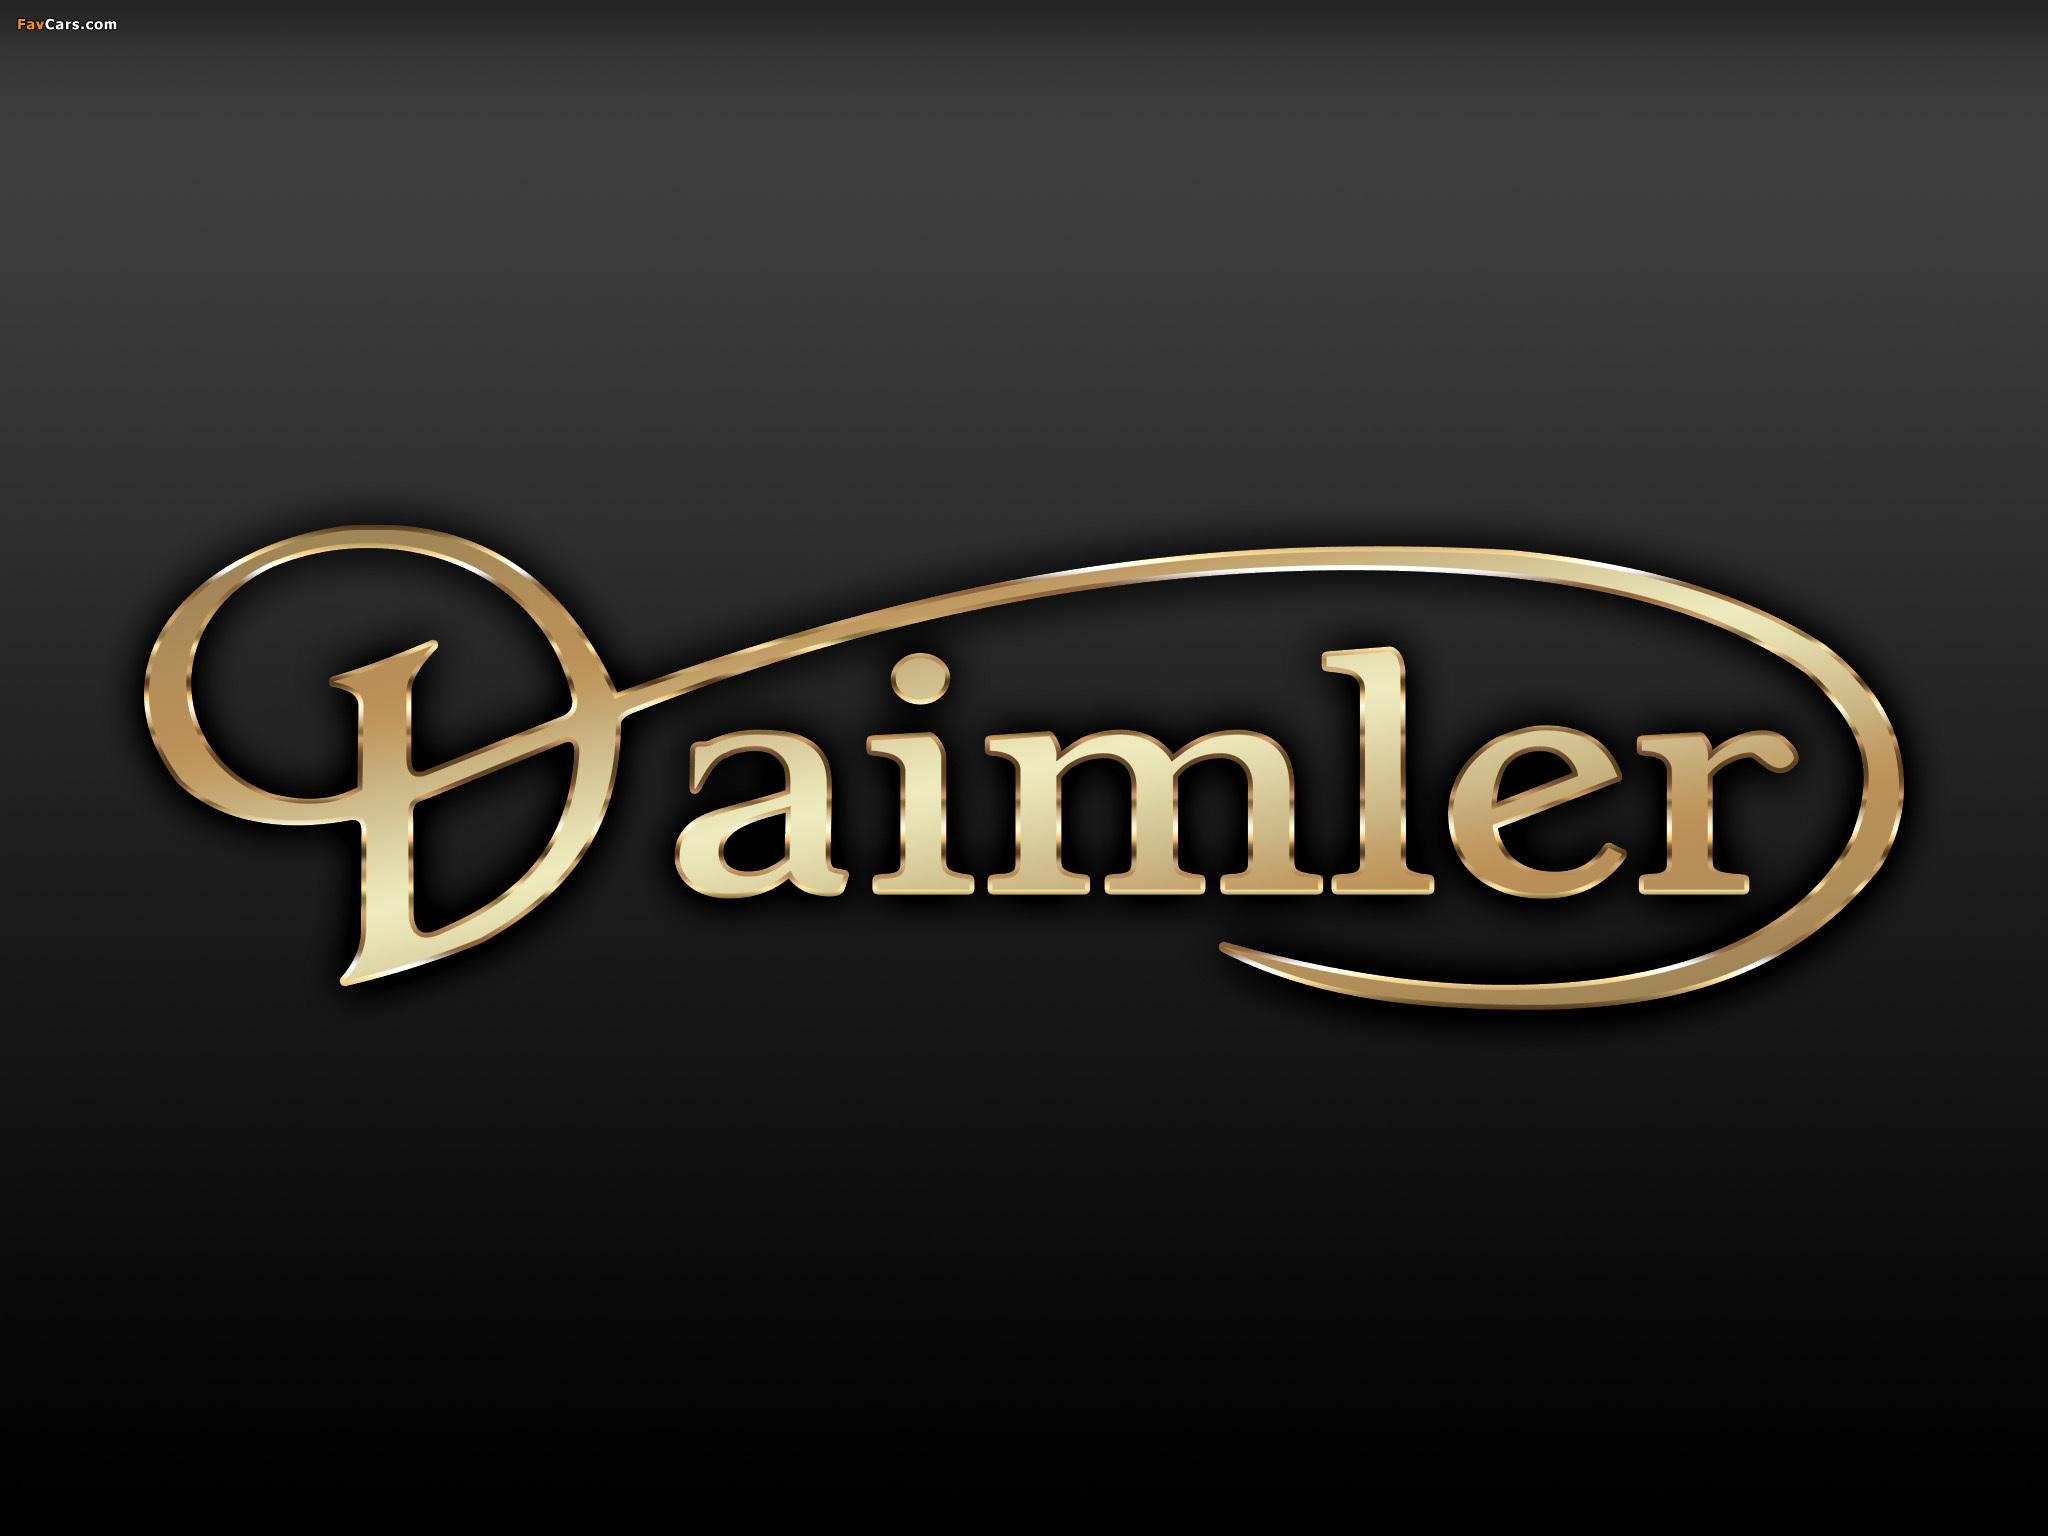 Daimler pictures (2048 x 1536)